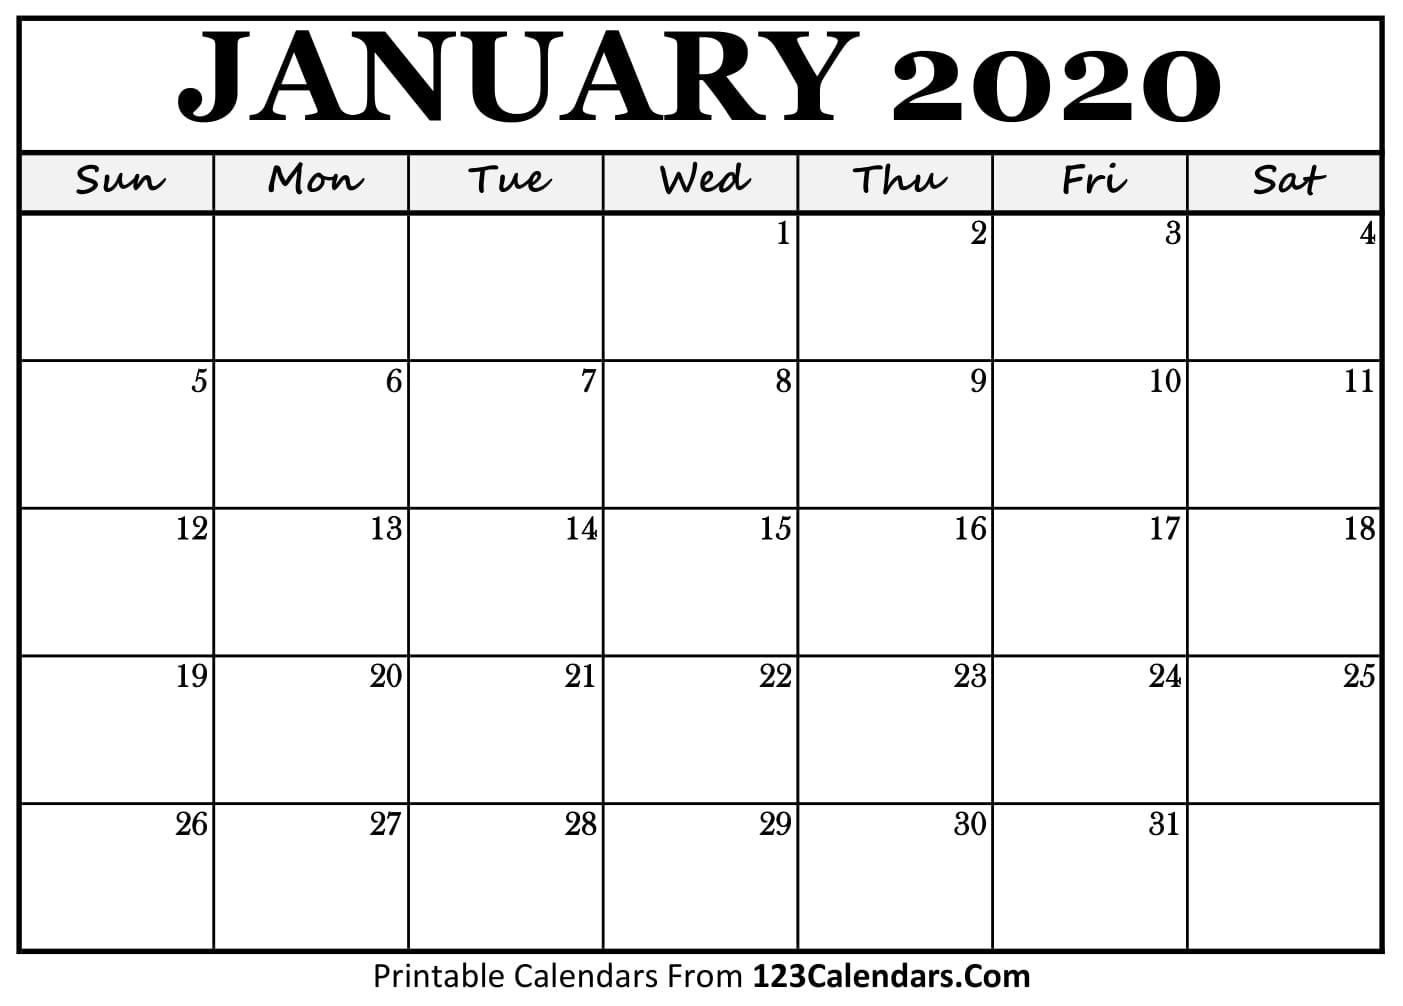 Free Printable Calendar | 123Calendars-8 X 10 Prinable Blank Monthly Calendar